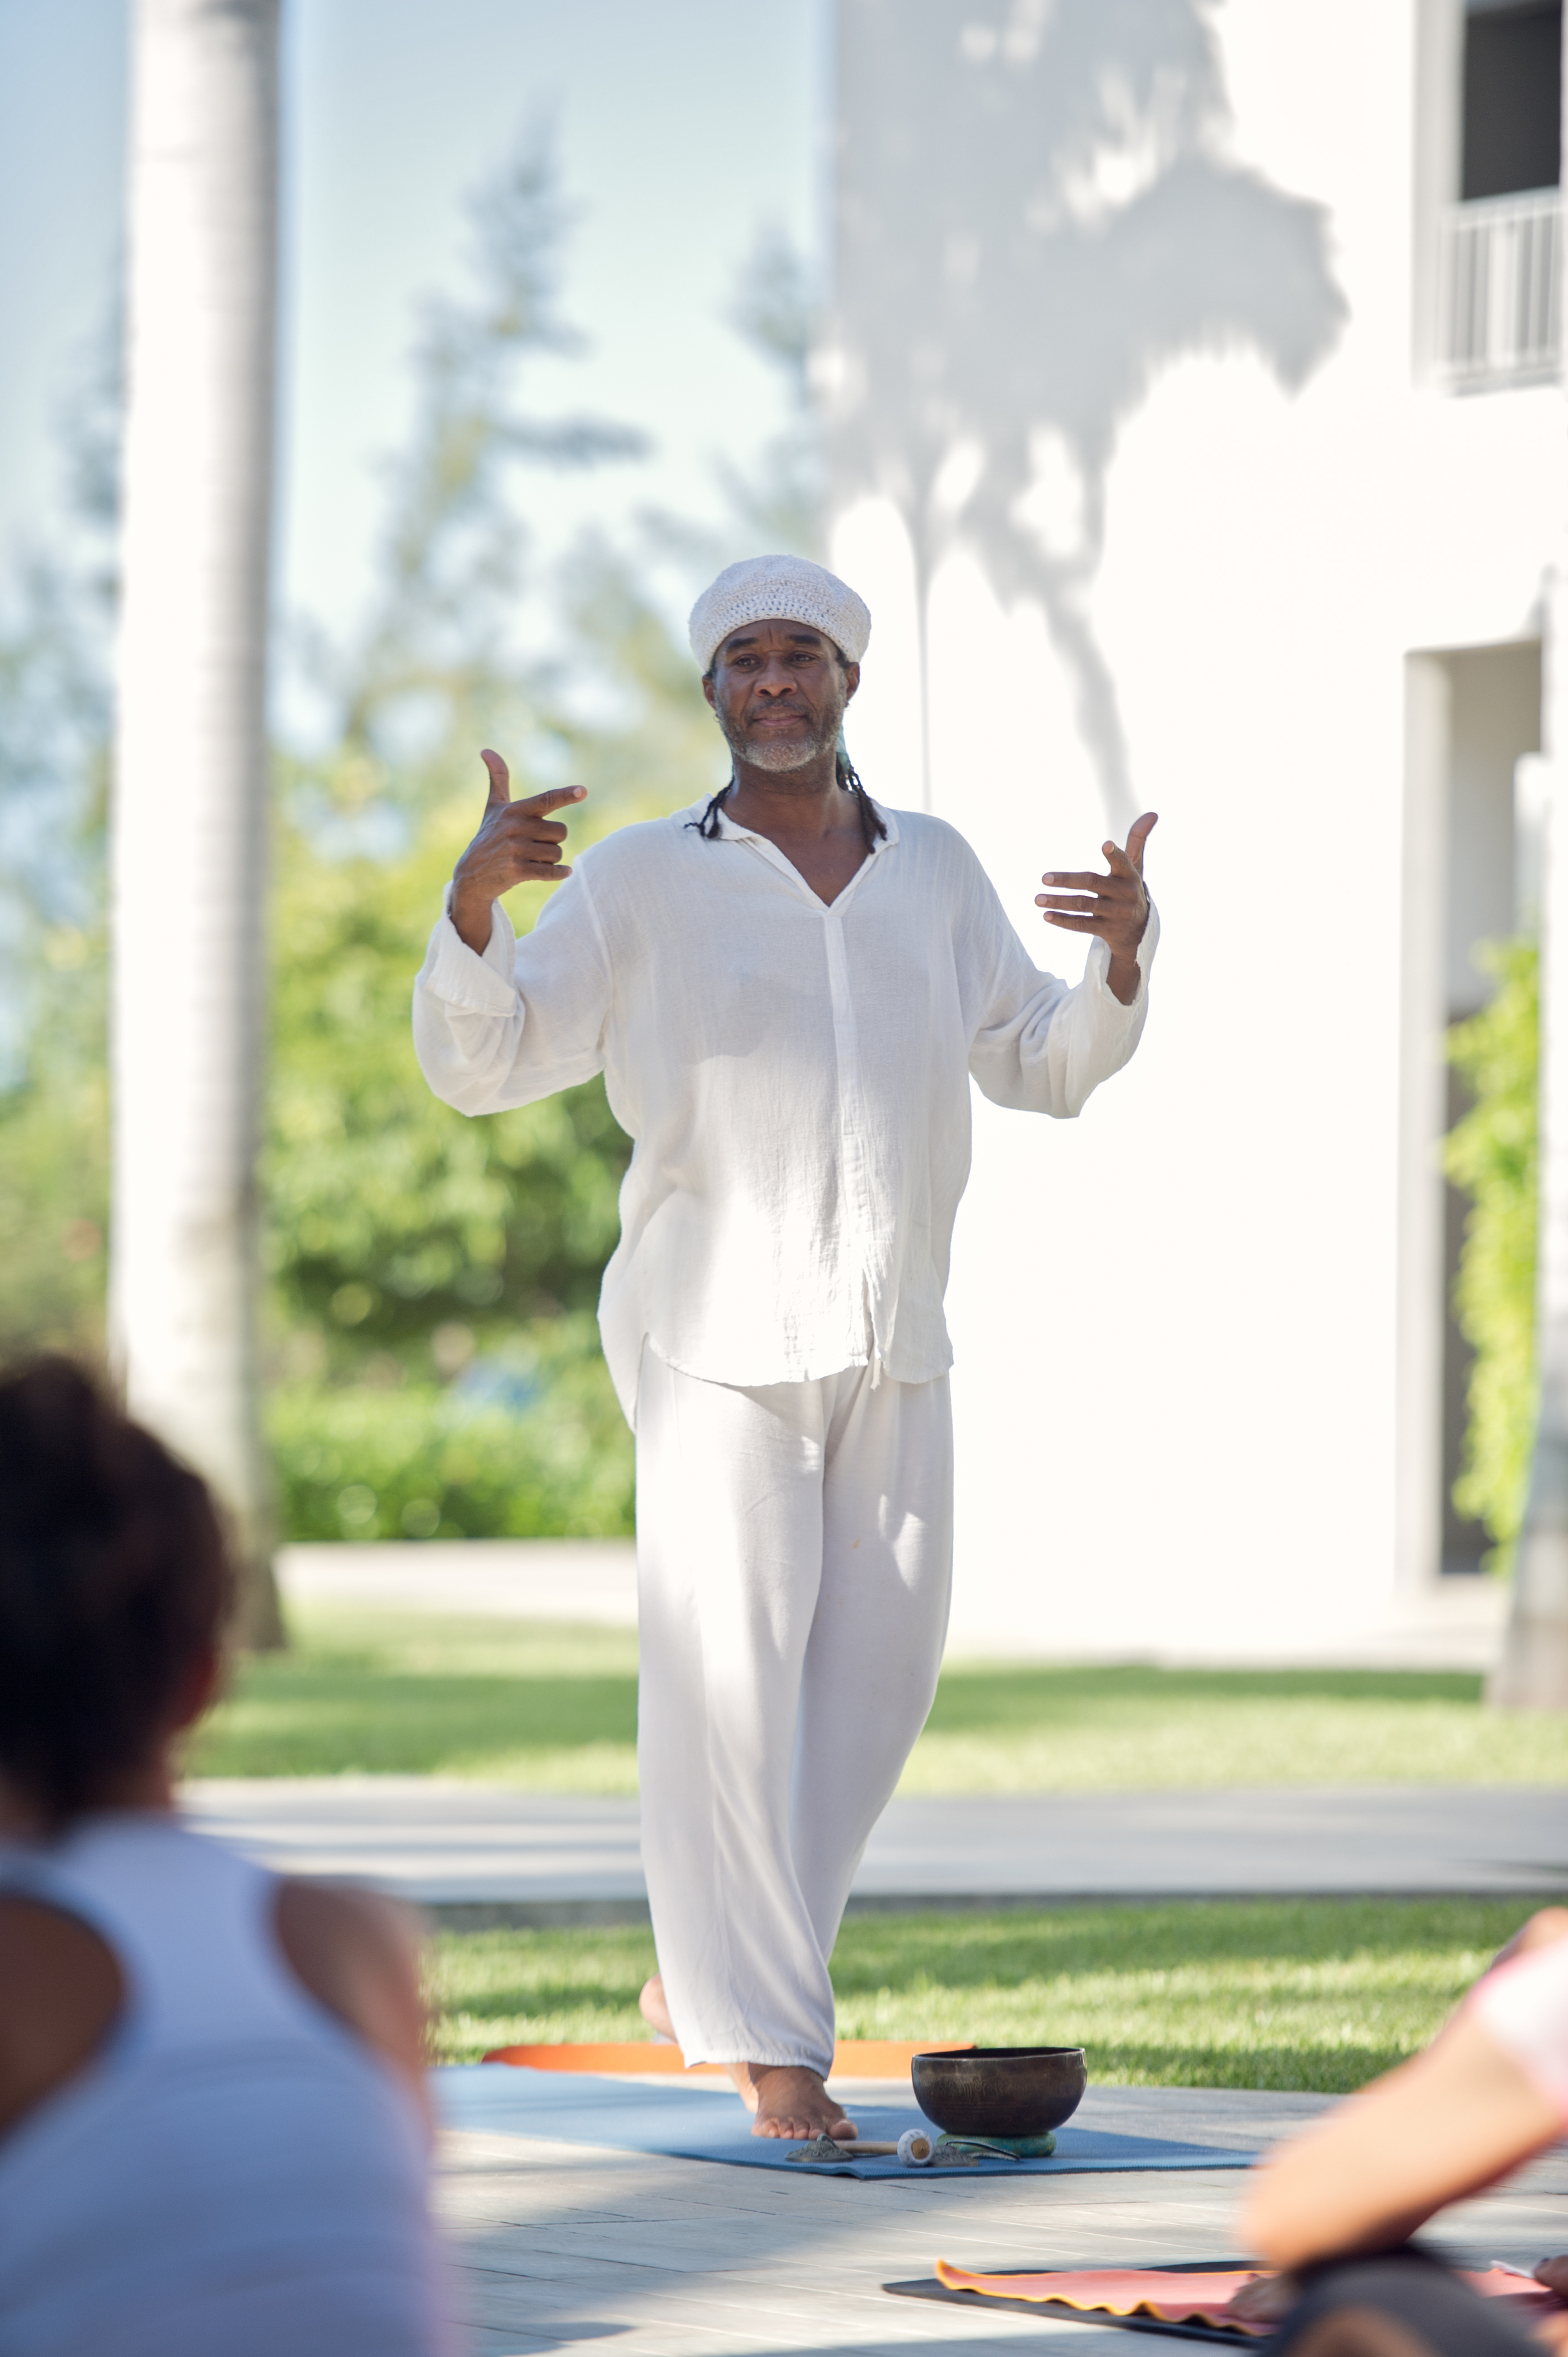 David Bowen, on The Eight Limbs of Yoga